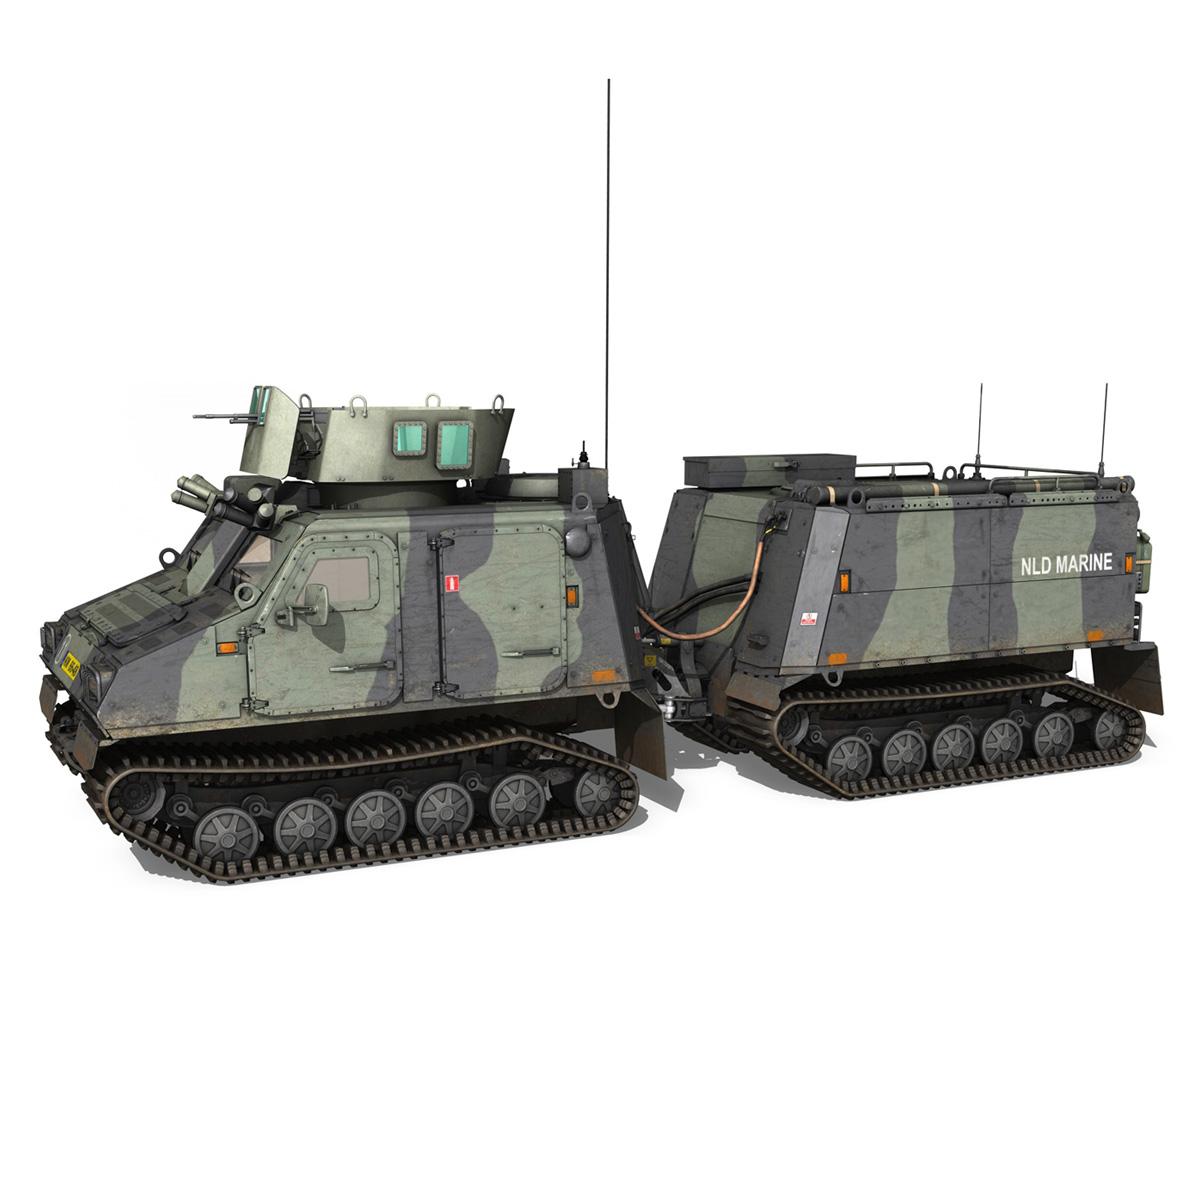 bvs10 viking – netherlands marine corps 3d model 3ds c4d lwo obj 293517